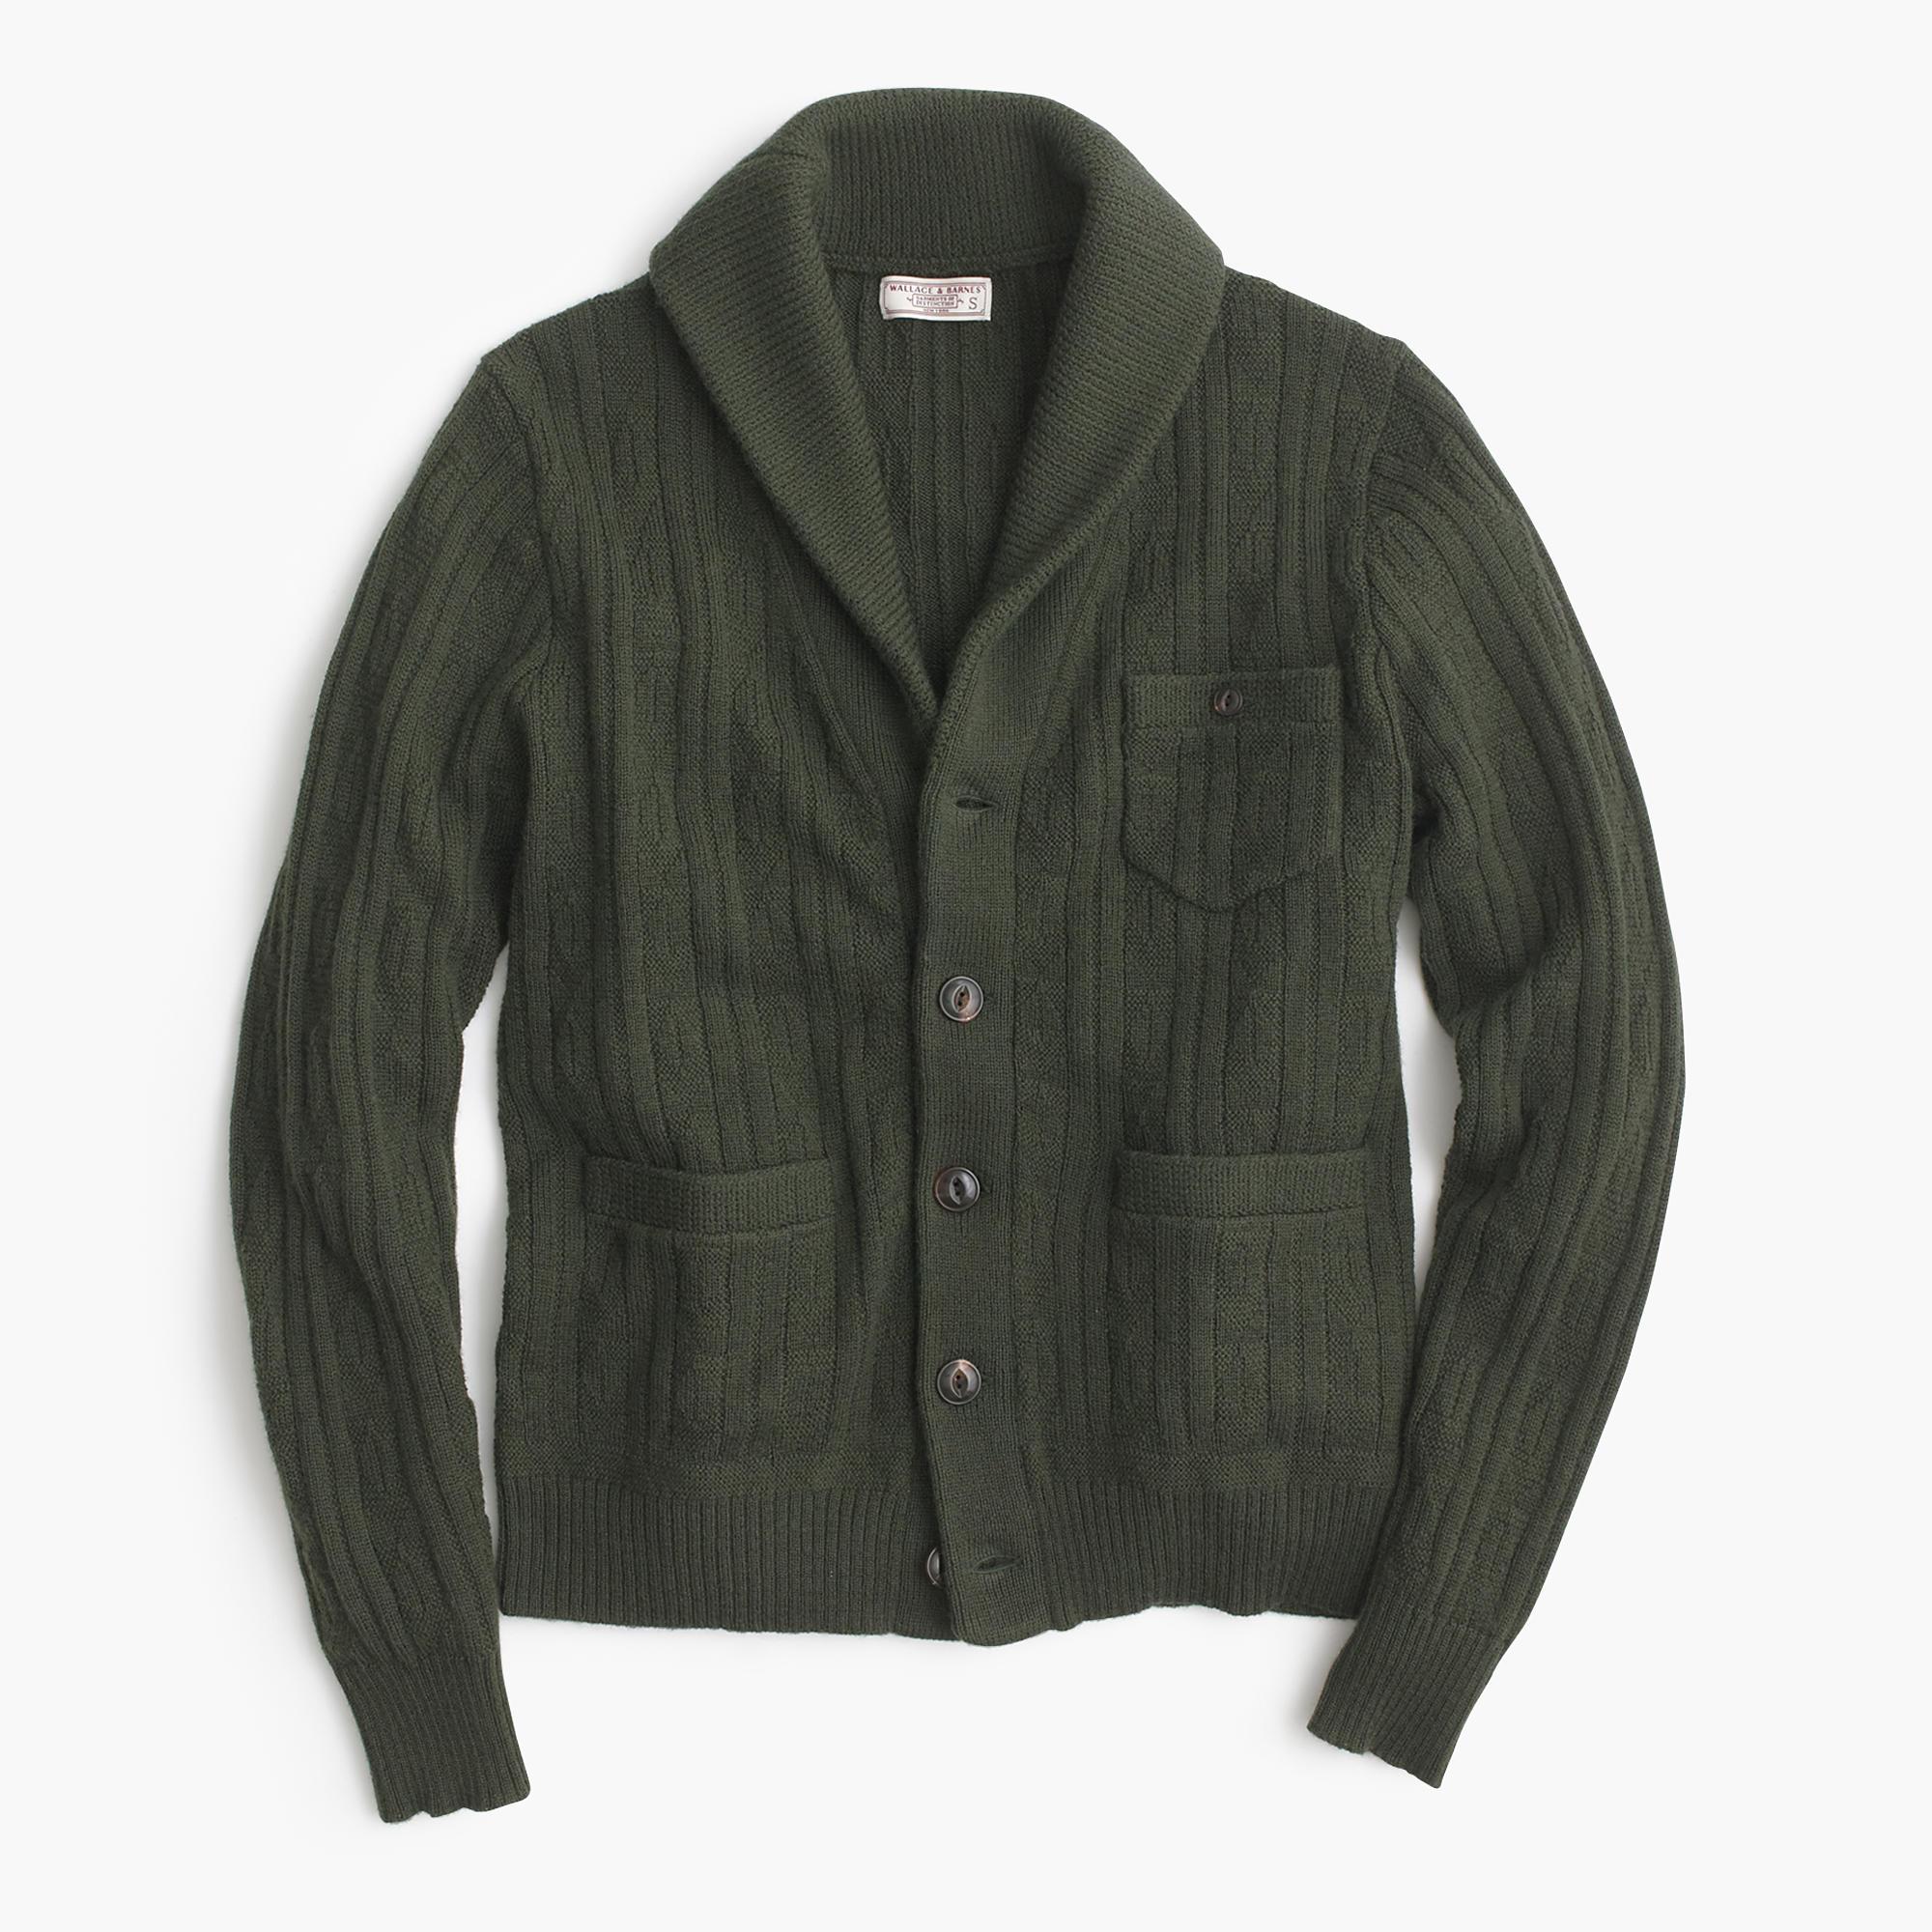 Wallace & Barnes Wool Shawl Cardigan Sweater :